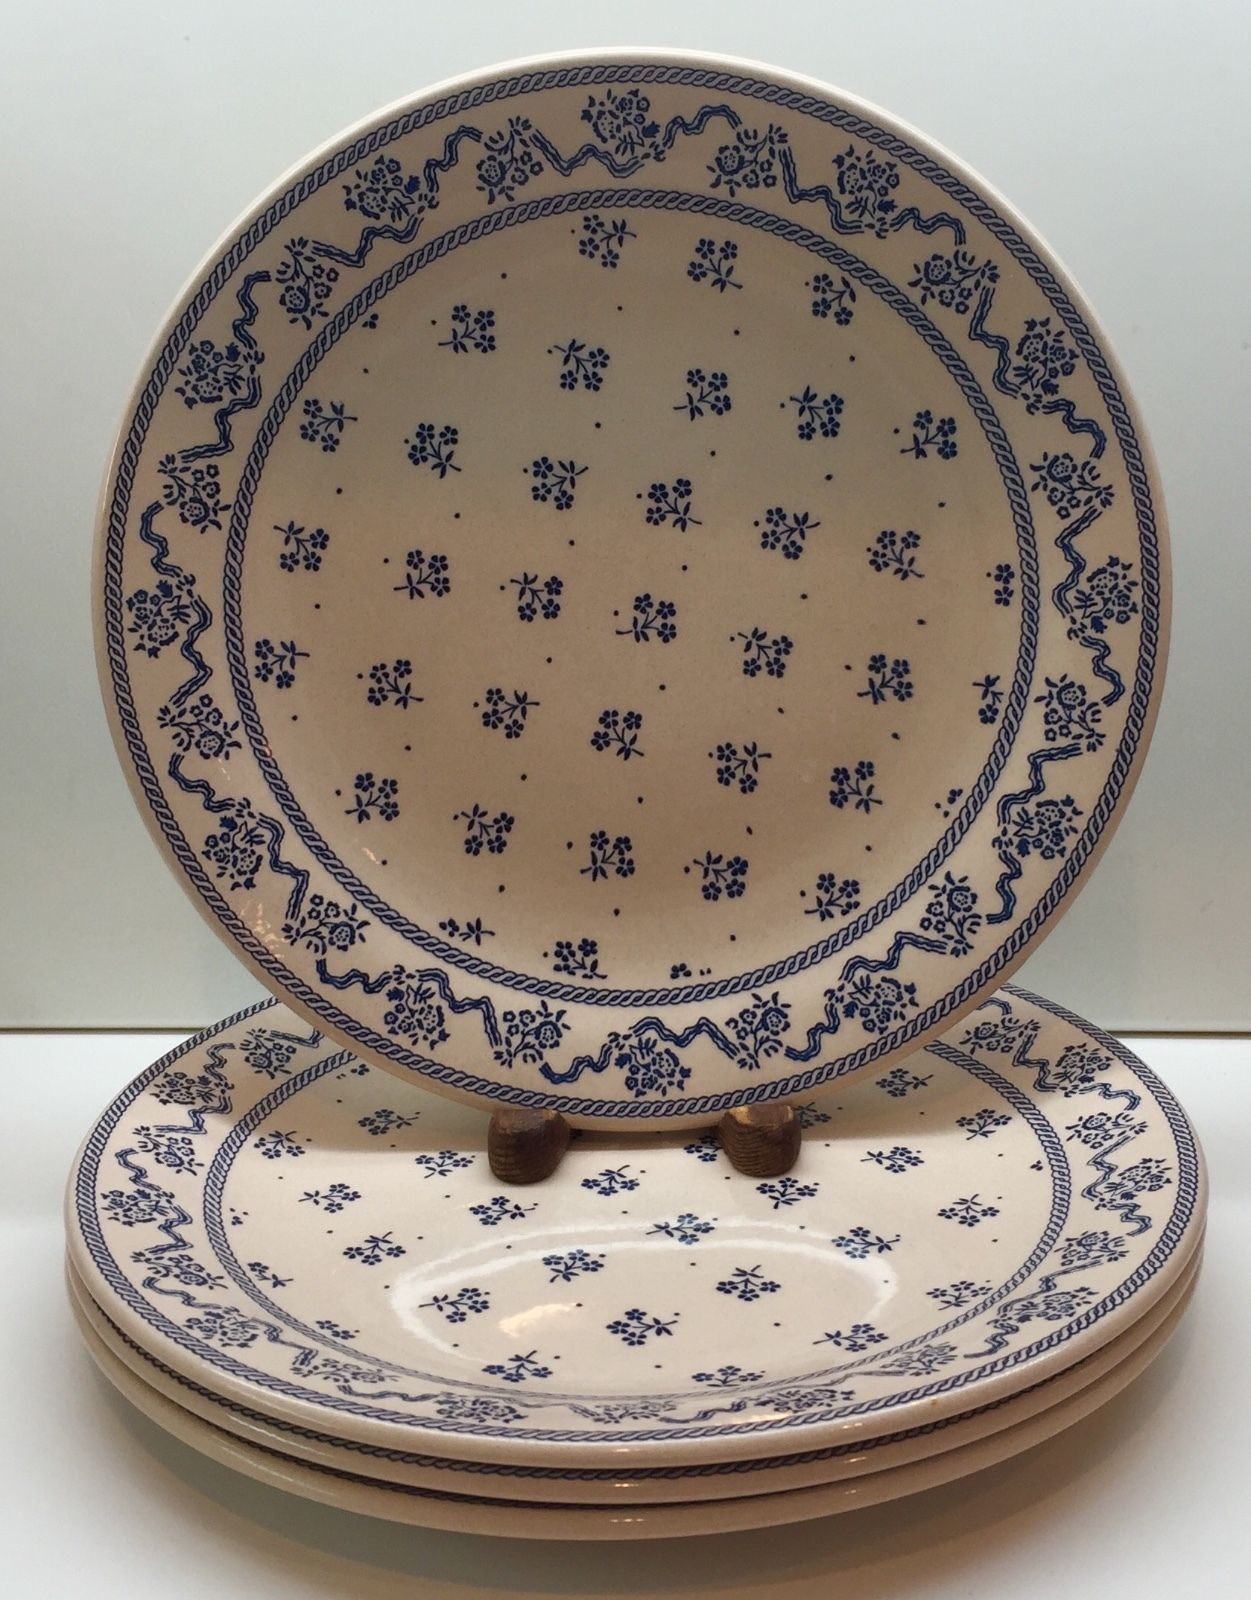 Johnson Brothers Laura Ashley PETITE FLEUR-BLUE 4 Dinner Plates | eBay & Johnson Brothers Laura Ashley PETITE FLEUR-BLUE 4 Dinner Plates ...